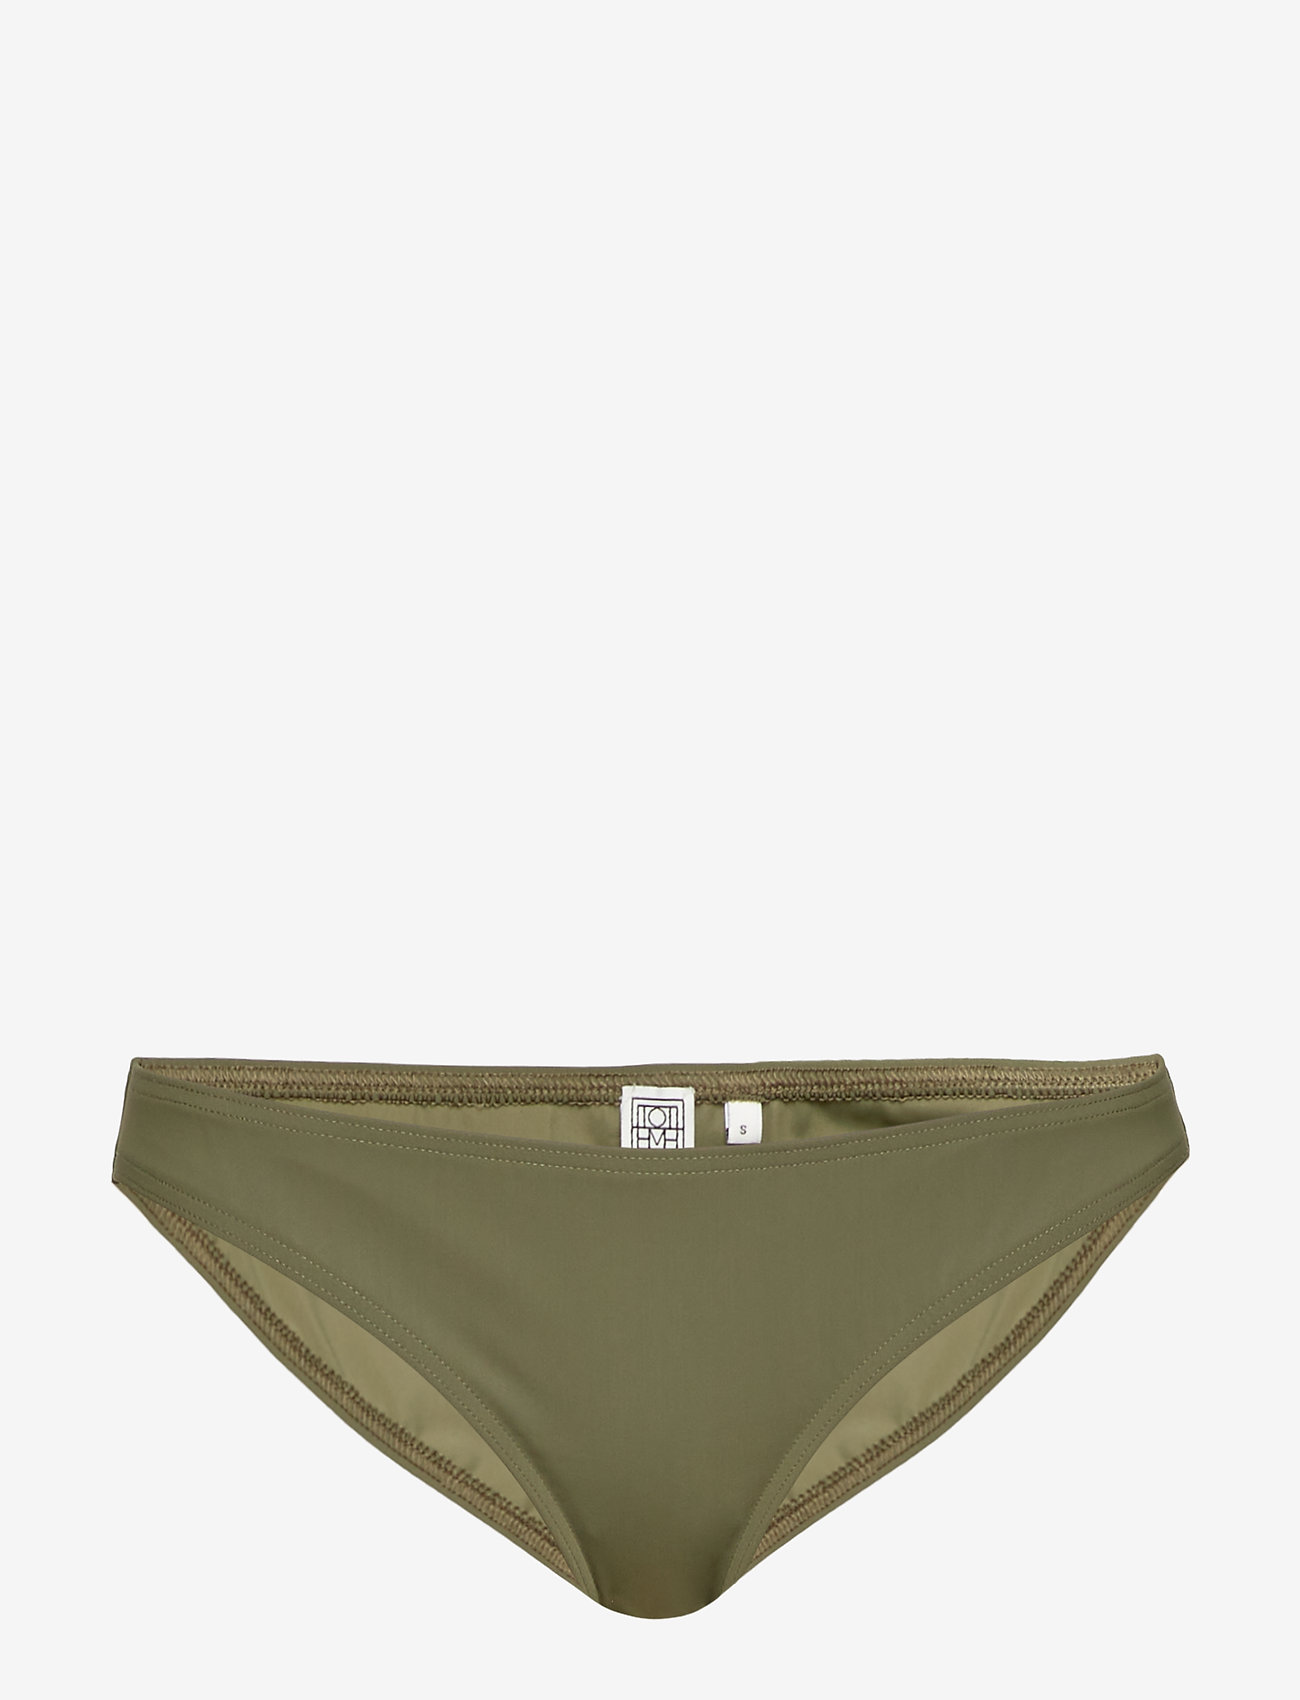 Totême - NANTES - bikini underdele - green 490 - 0